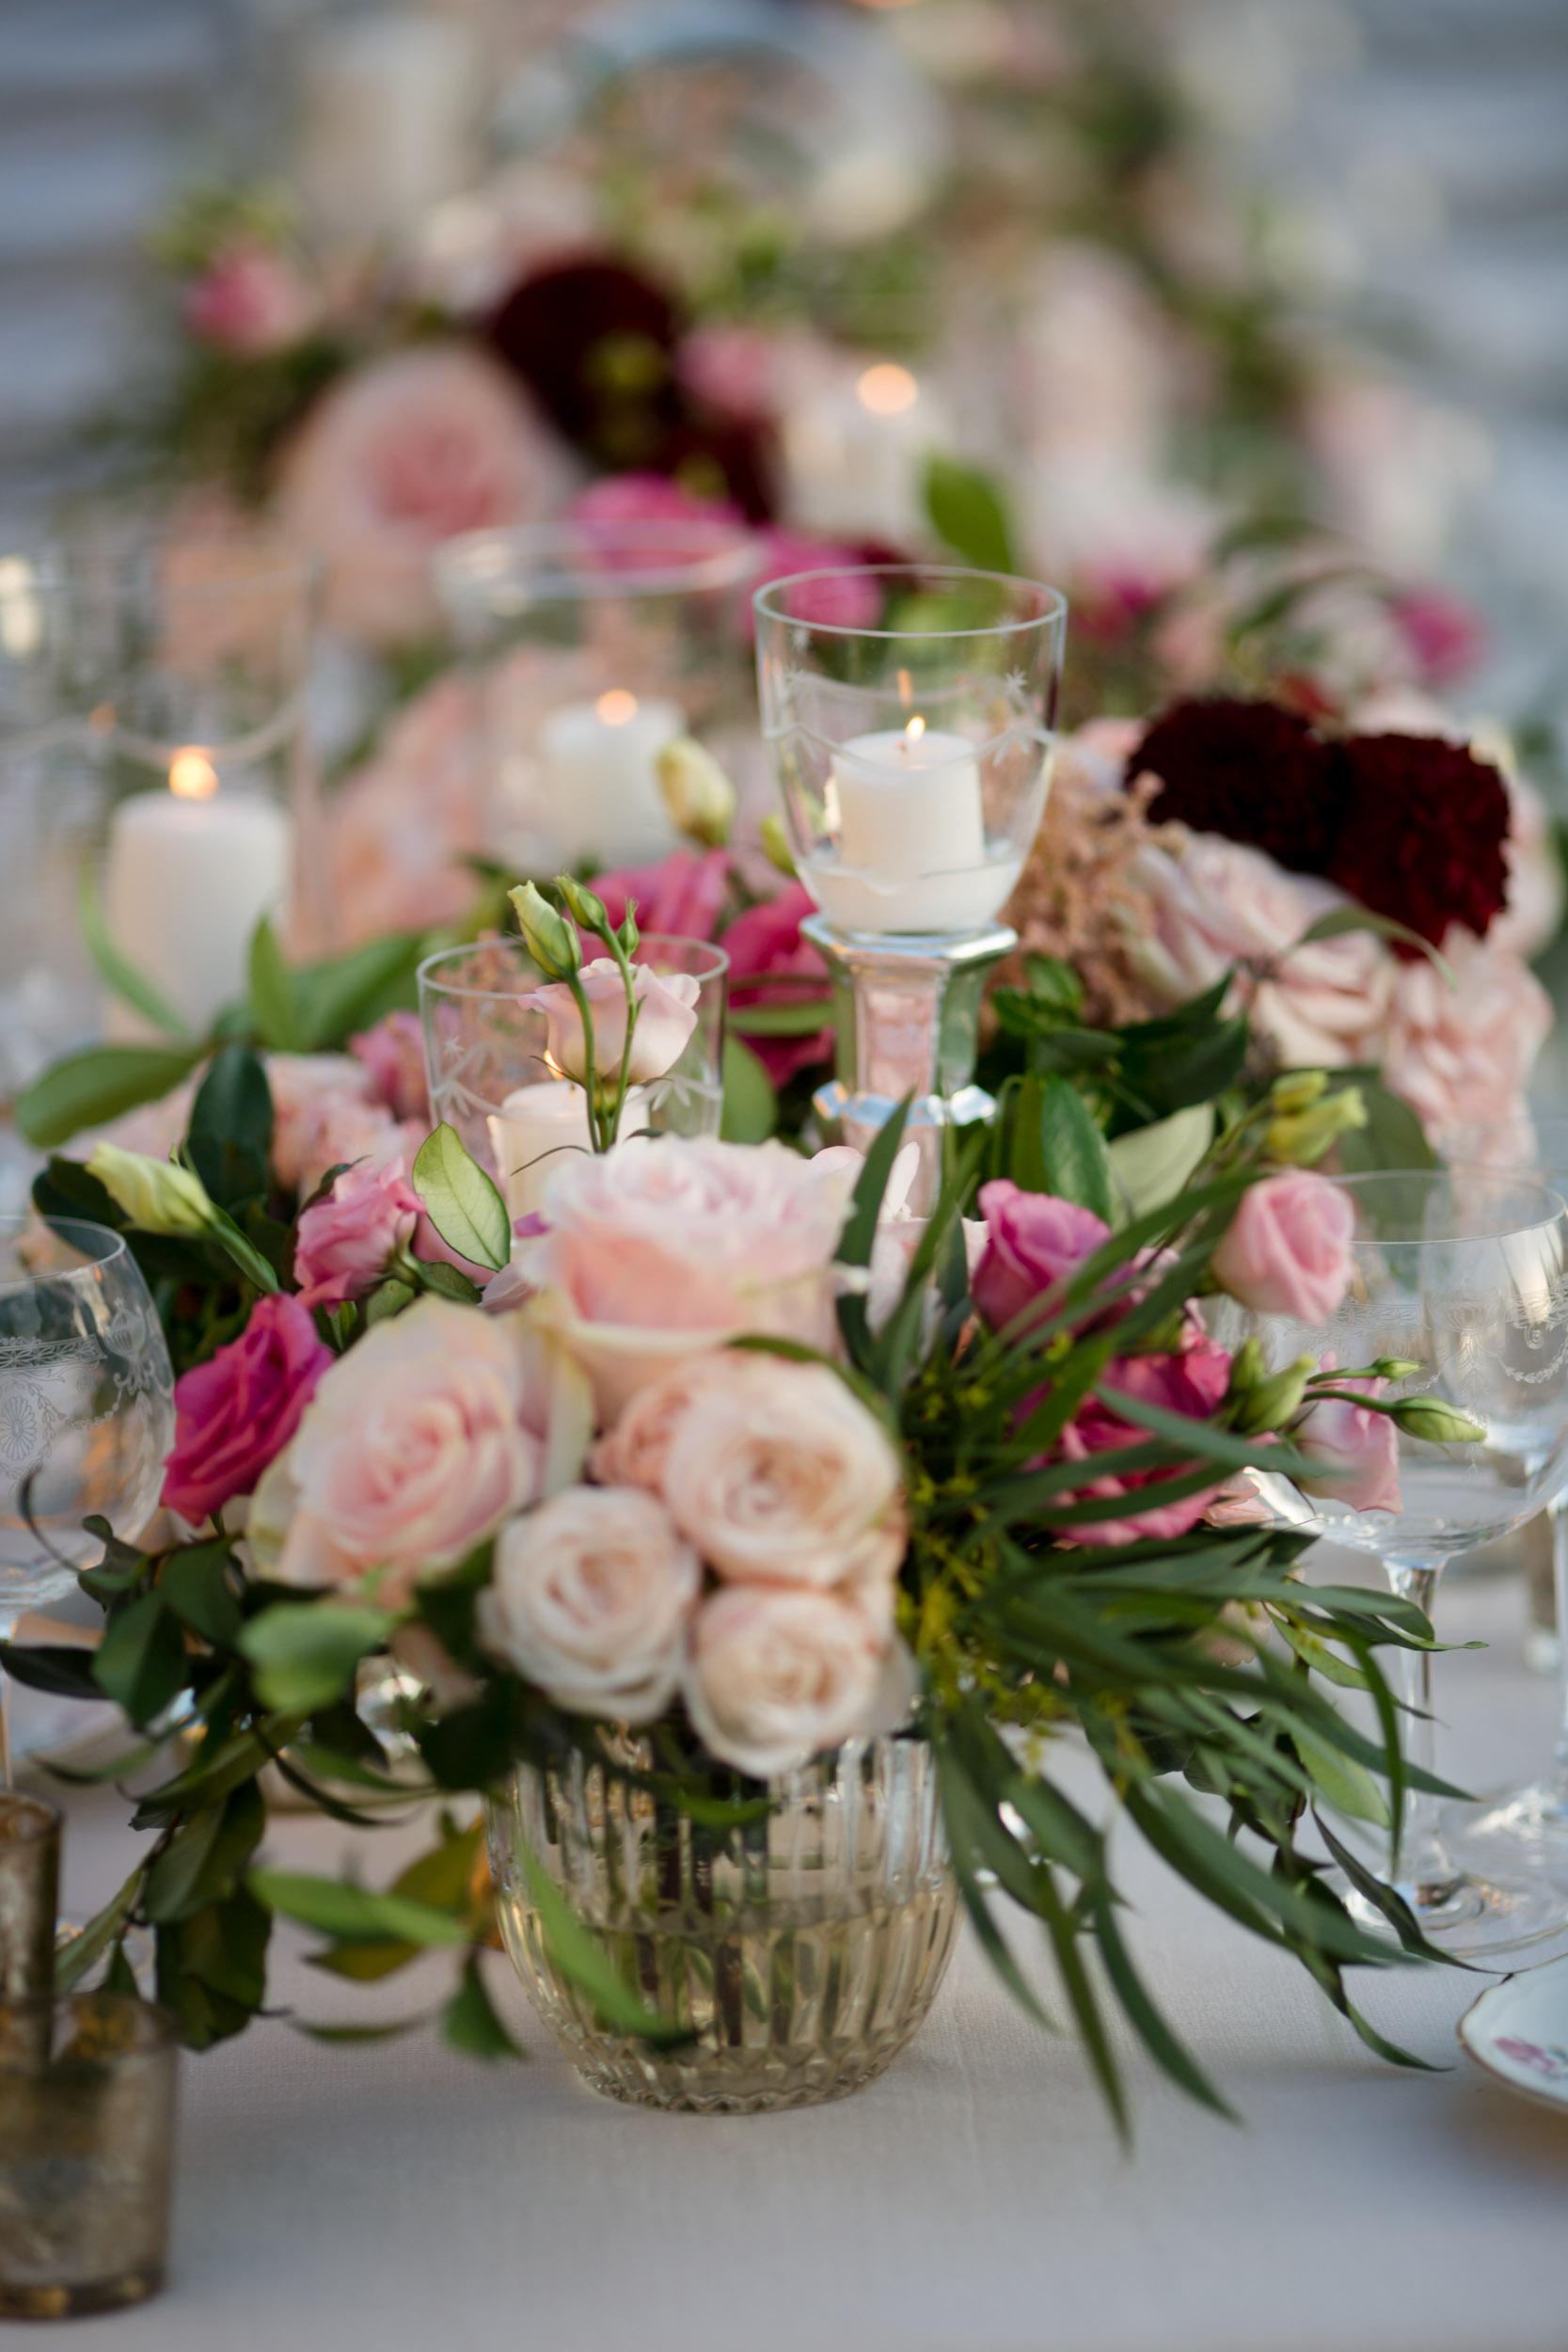 villa-gamberaia-florence-italy-destination-wedding-62.jpg